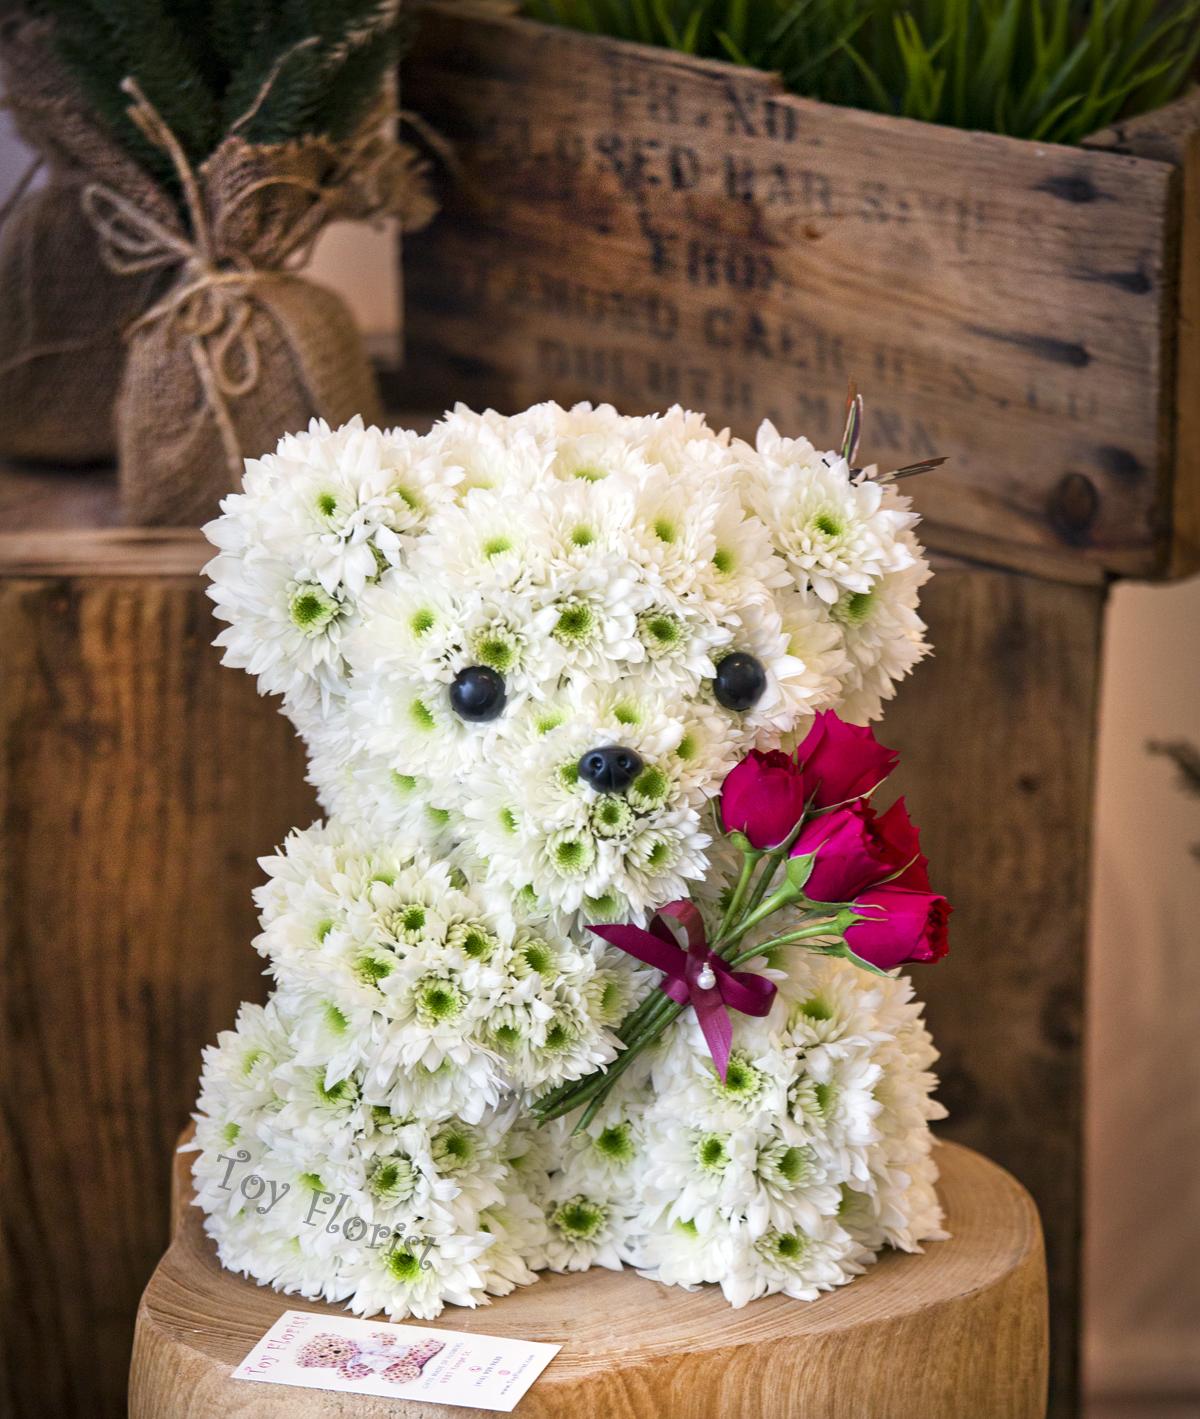 Unique Floral Design Ideas: Unique Gifts Made Of Fresh Flowers